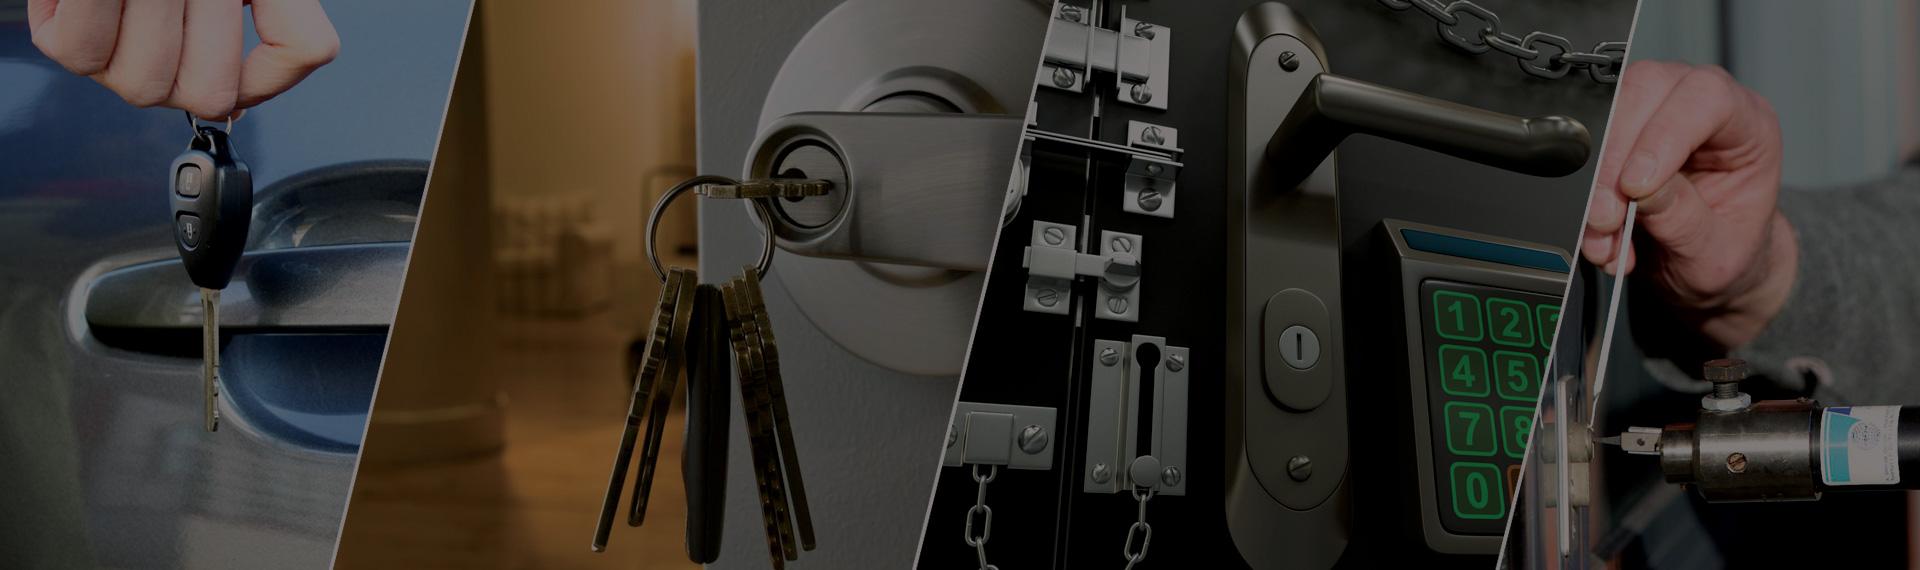 A 24 Hours Emergency Locksmith White Plains NY